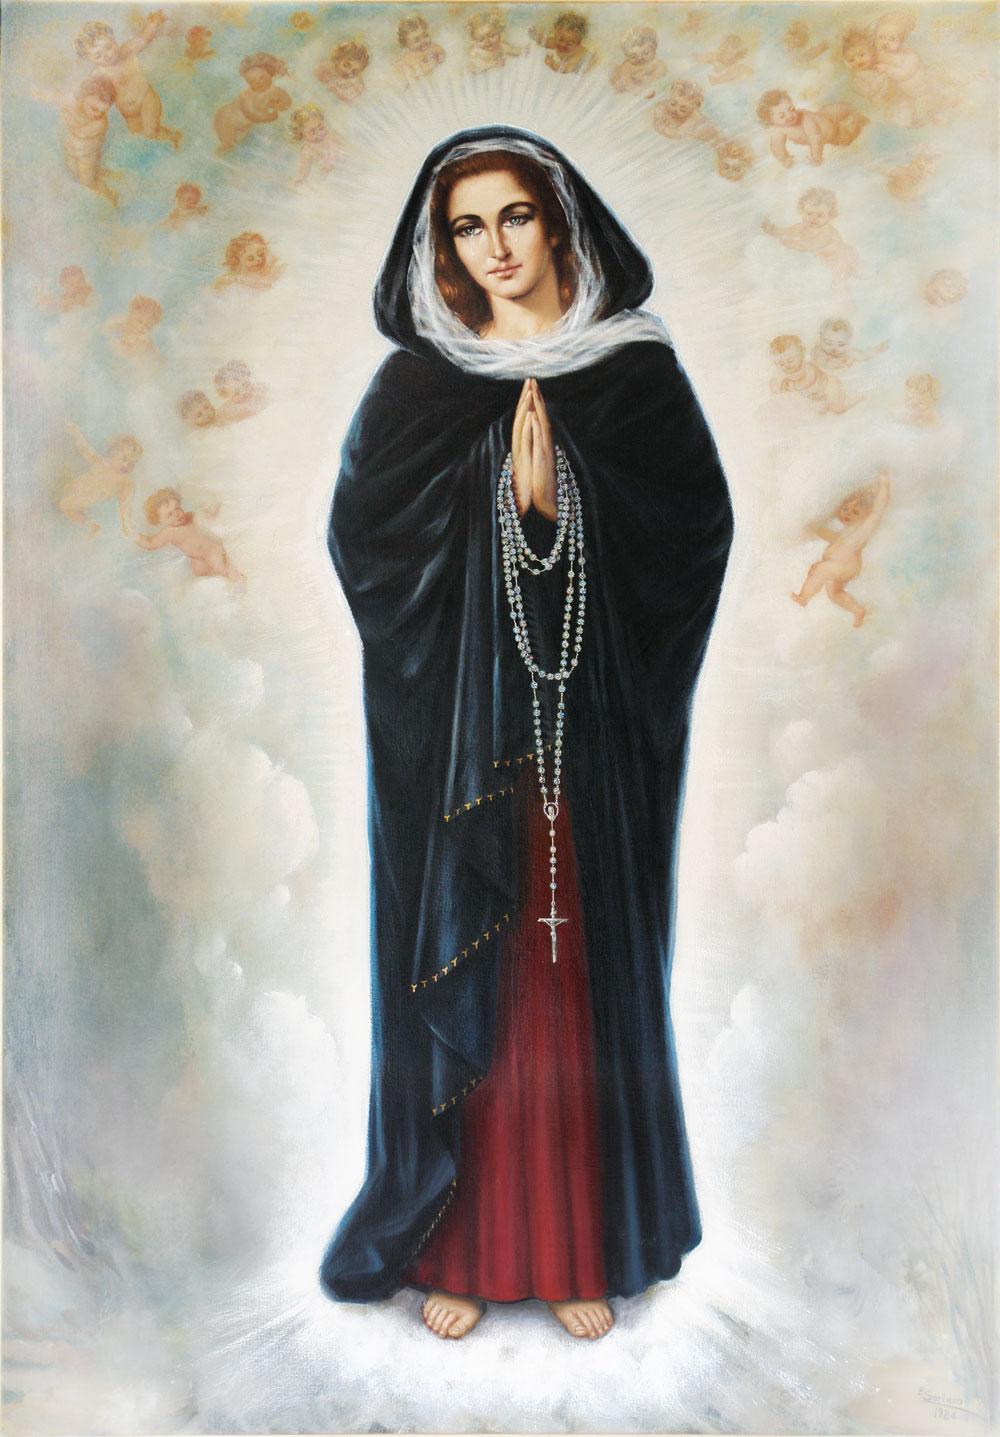 pelo largo Virgen semen en la boca